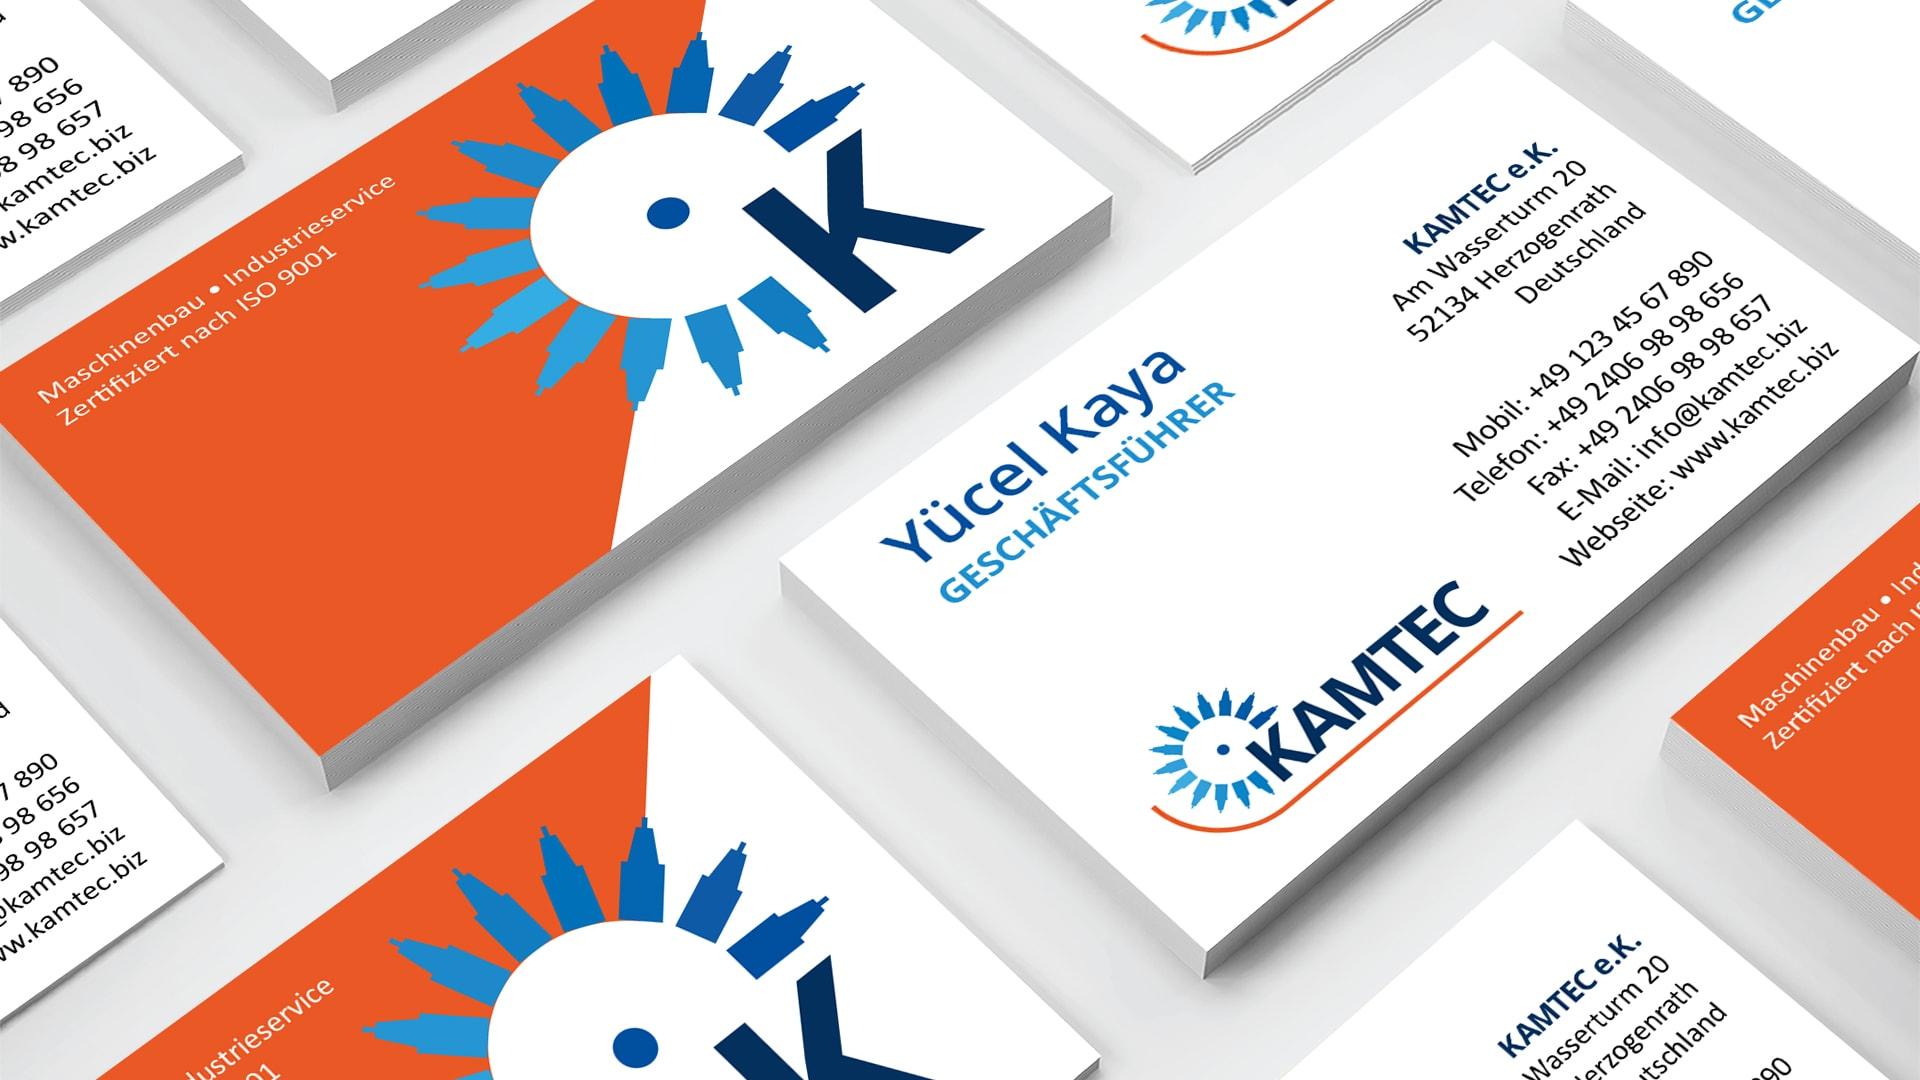 Visitenkarten KAMTEC e.K. – Maschinenbau und Industrieservice